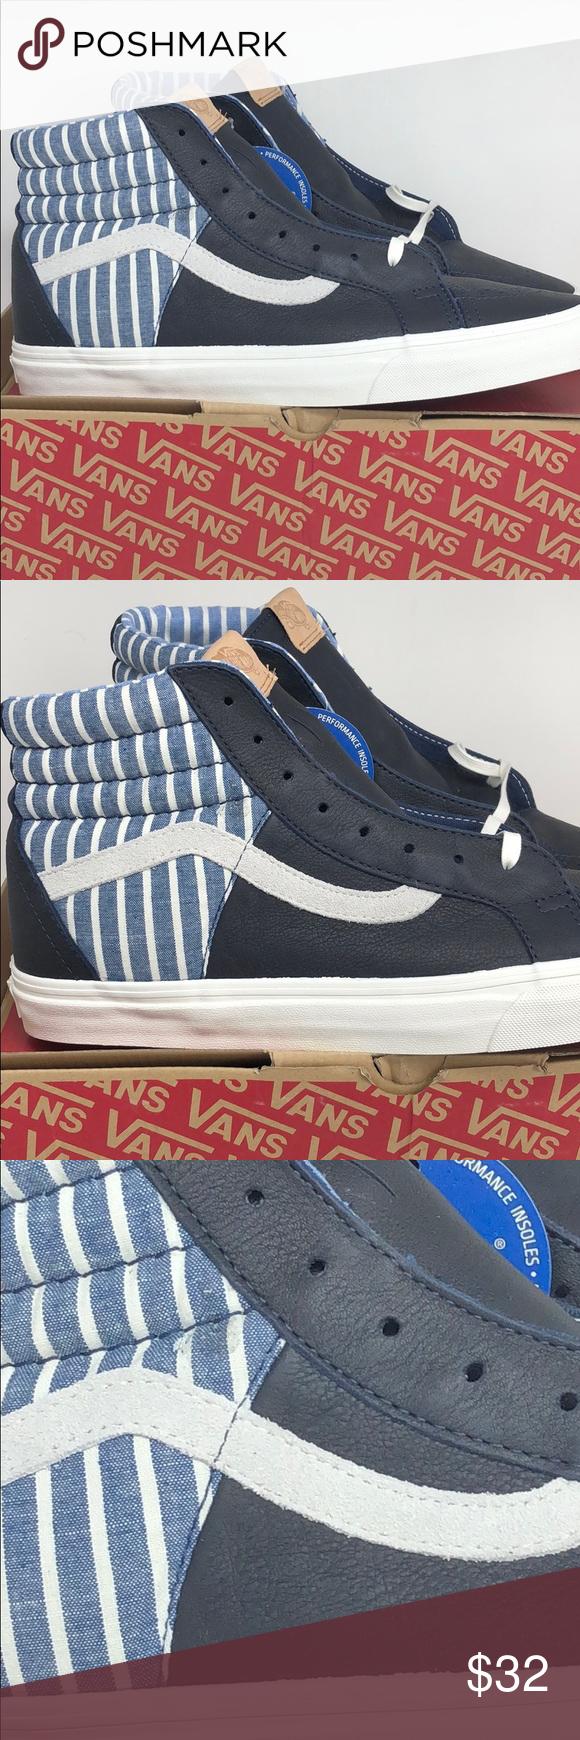 63ce256295 Vans SK8 Hi 46 CA Stripes Dress Blues Size 13 Mens Brand new in box! Vans  Shoes Sneakers